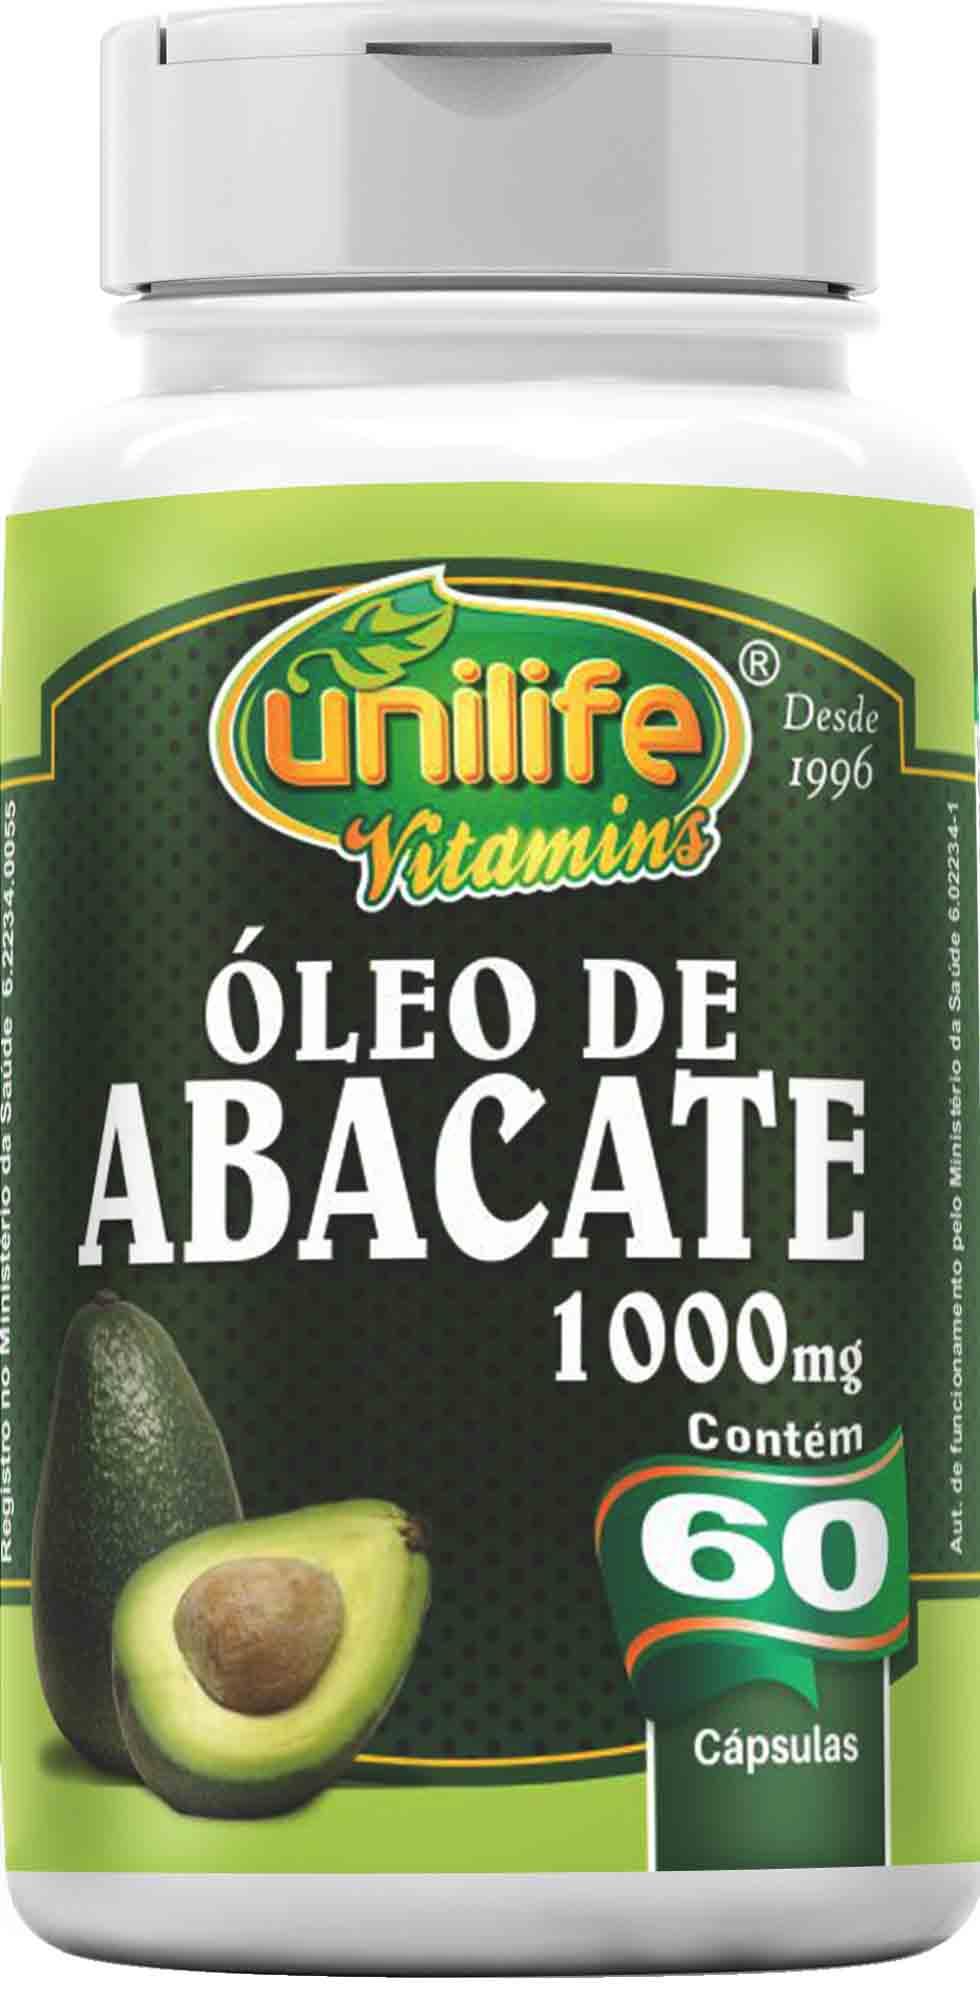 UNI OLEO DE ABACATE 1200 MG - 60 CAPS Unilife